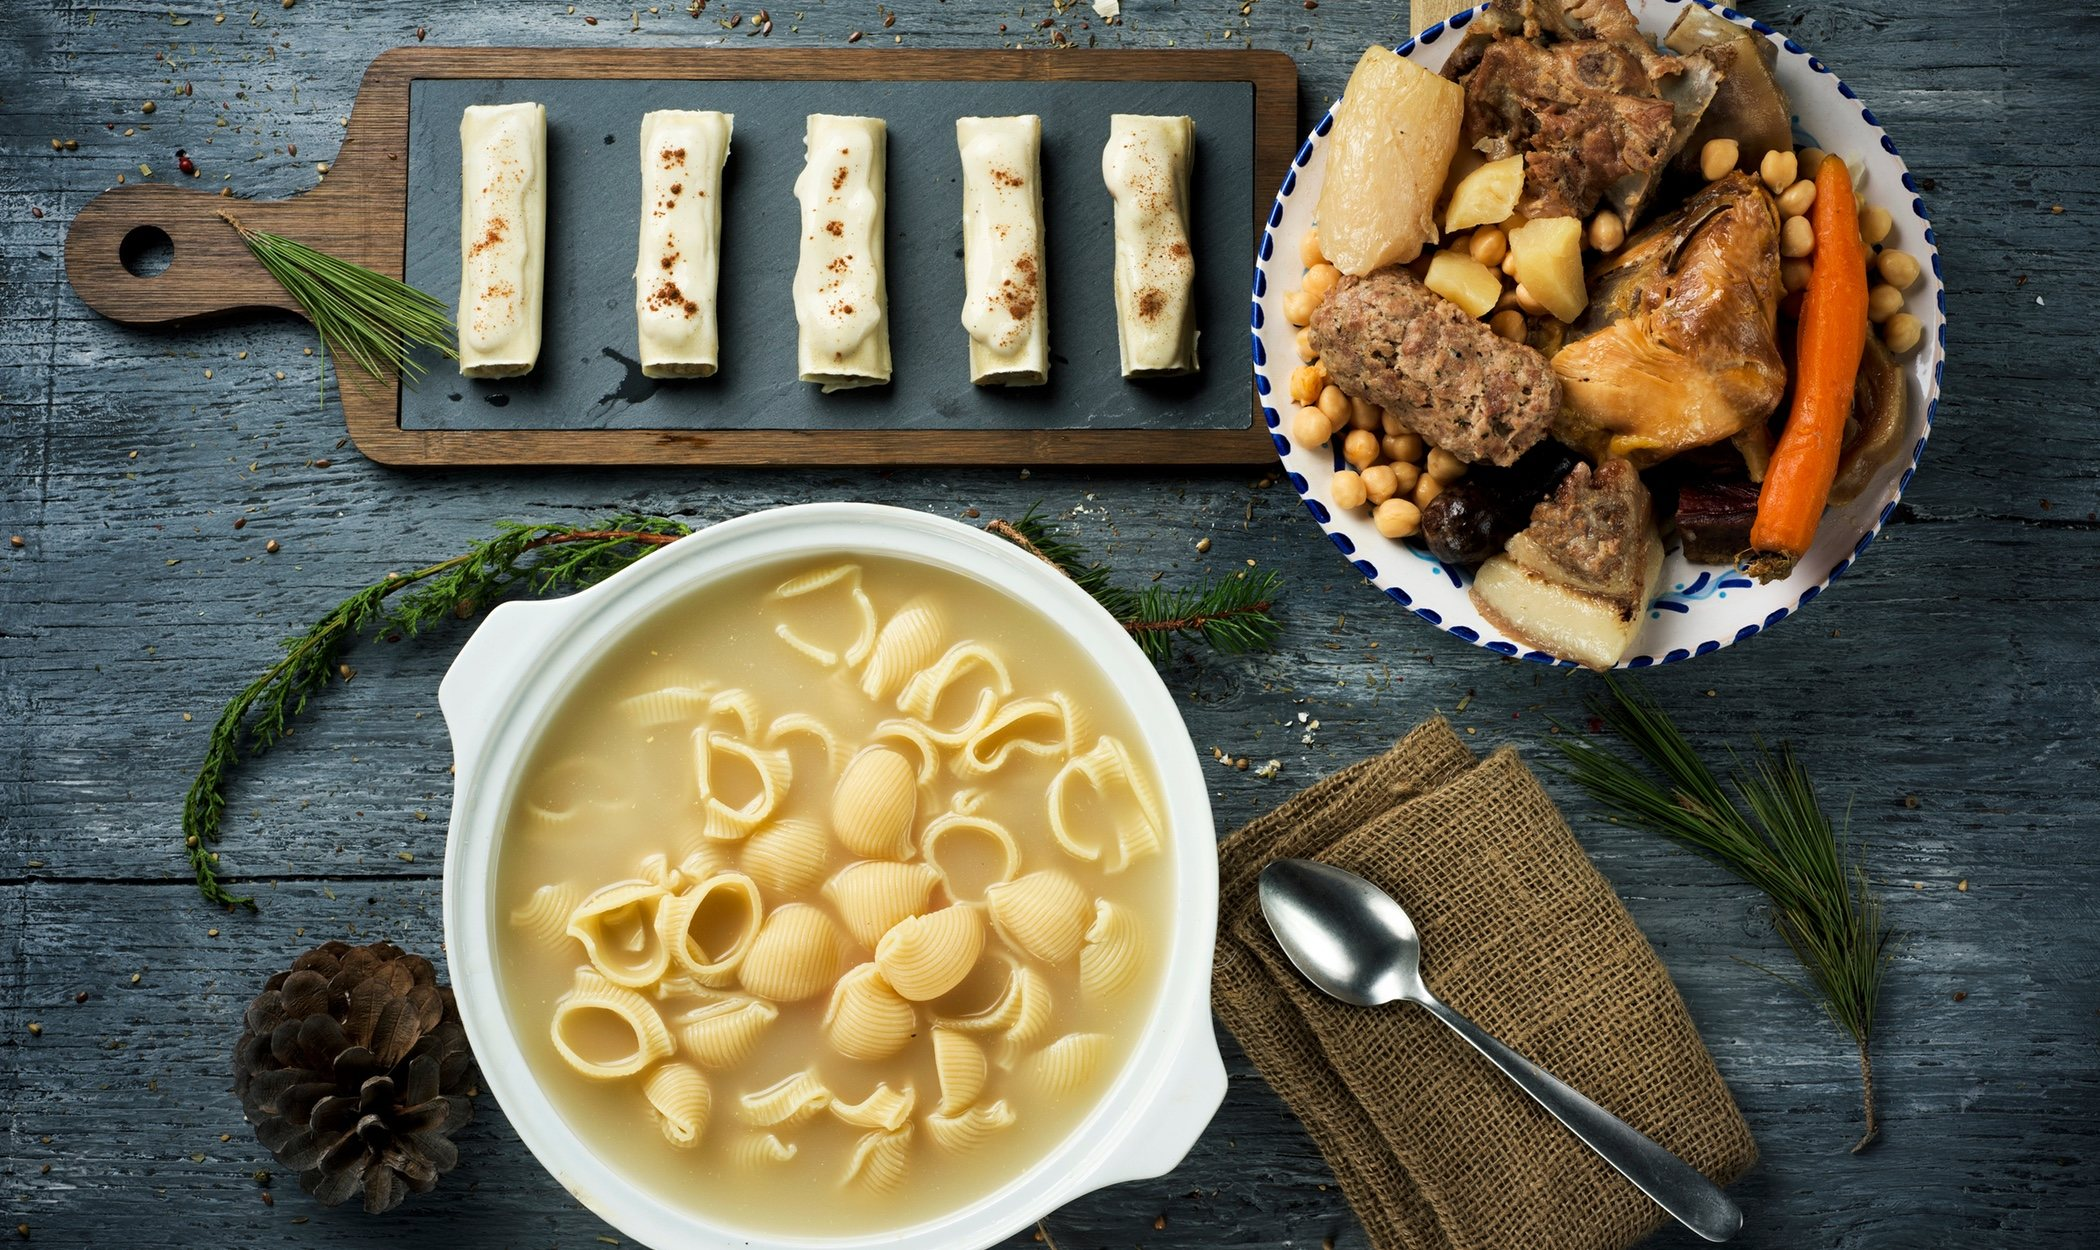 Gastronomía típica del día de San Esteban